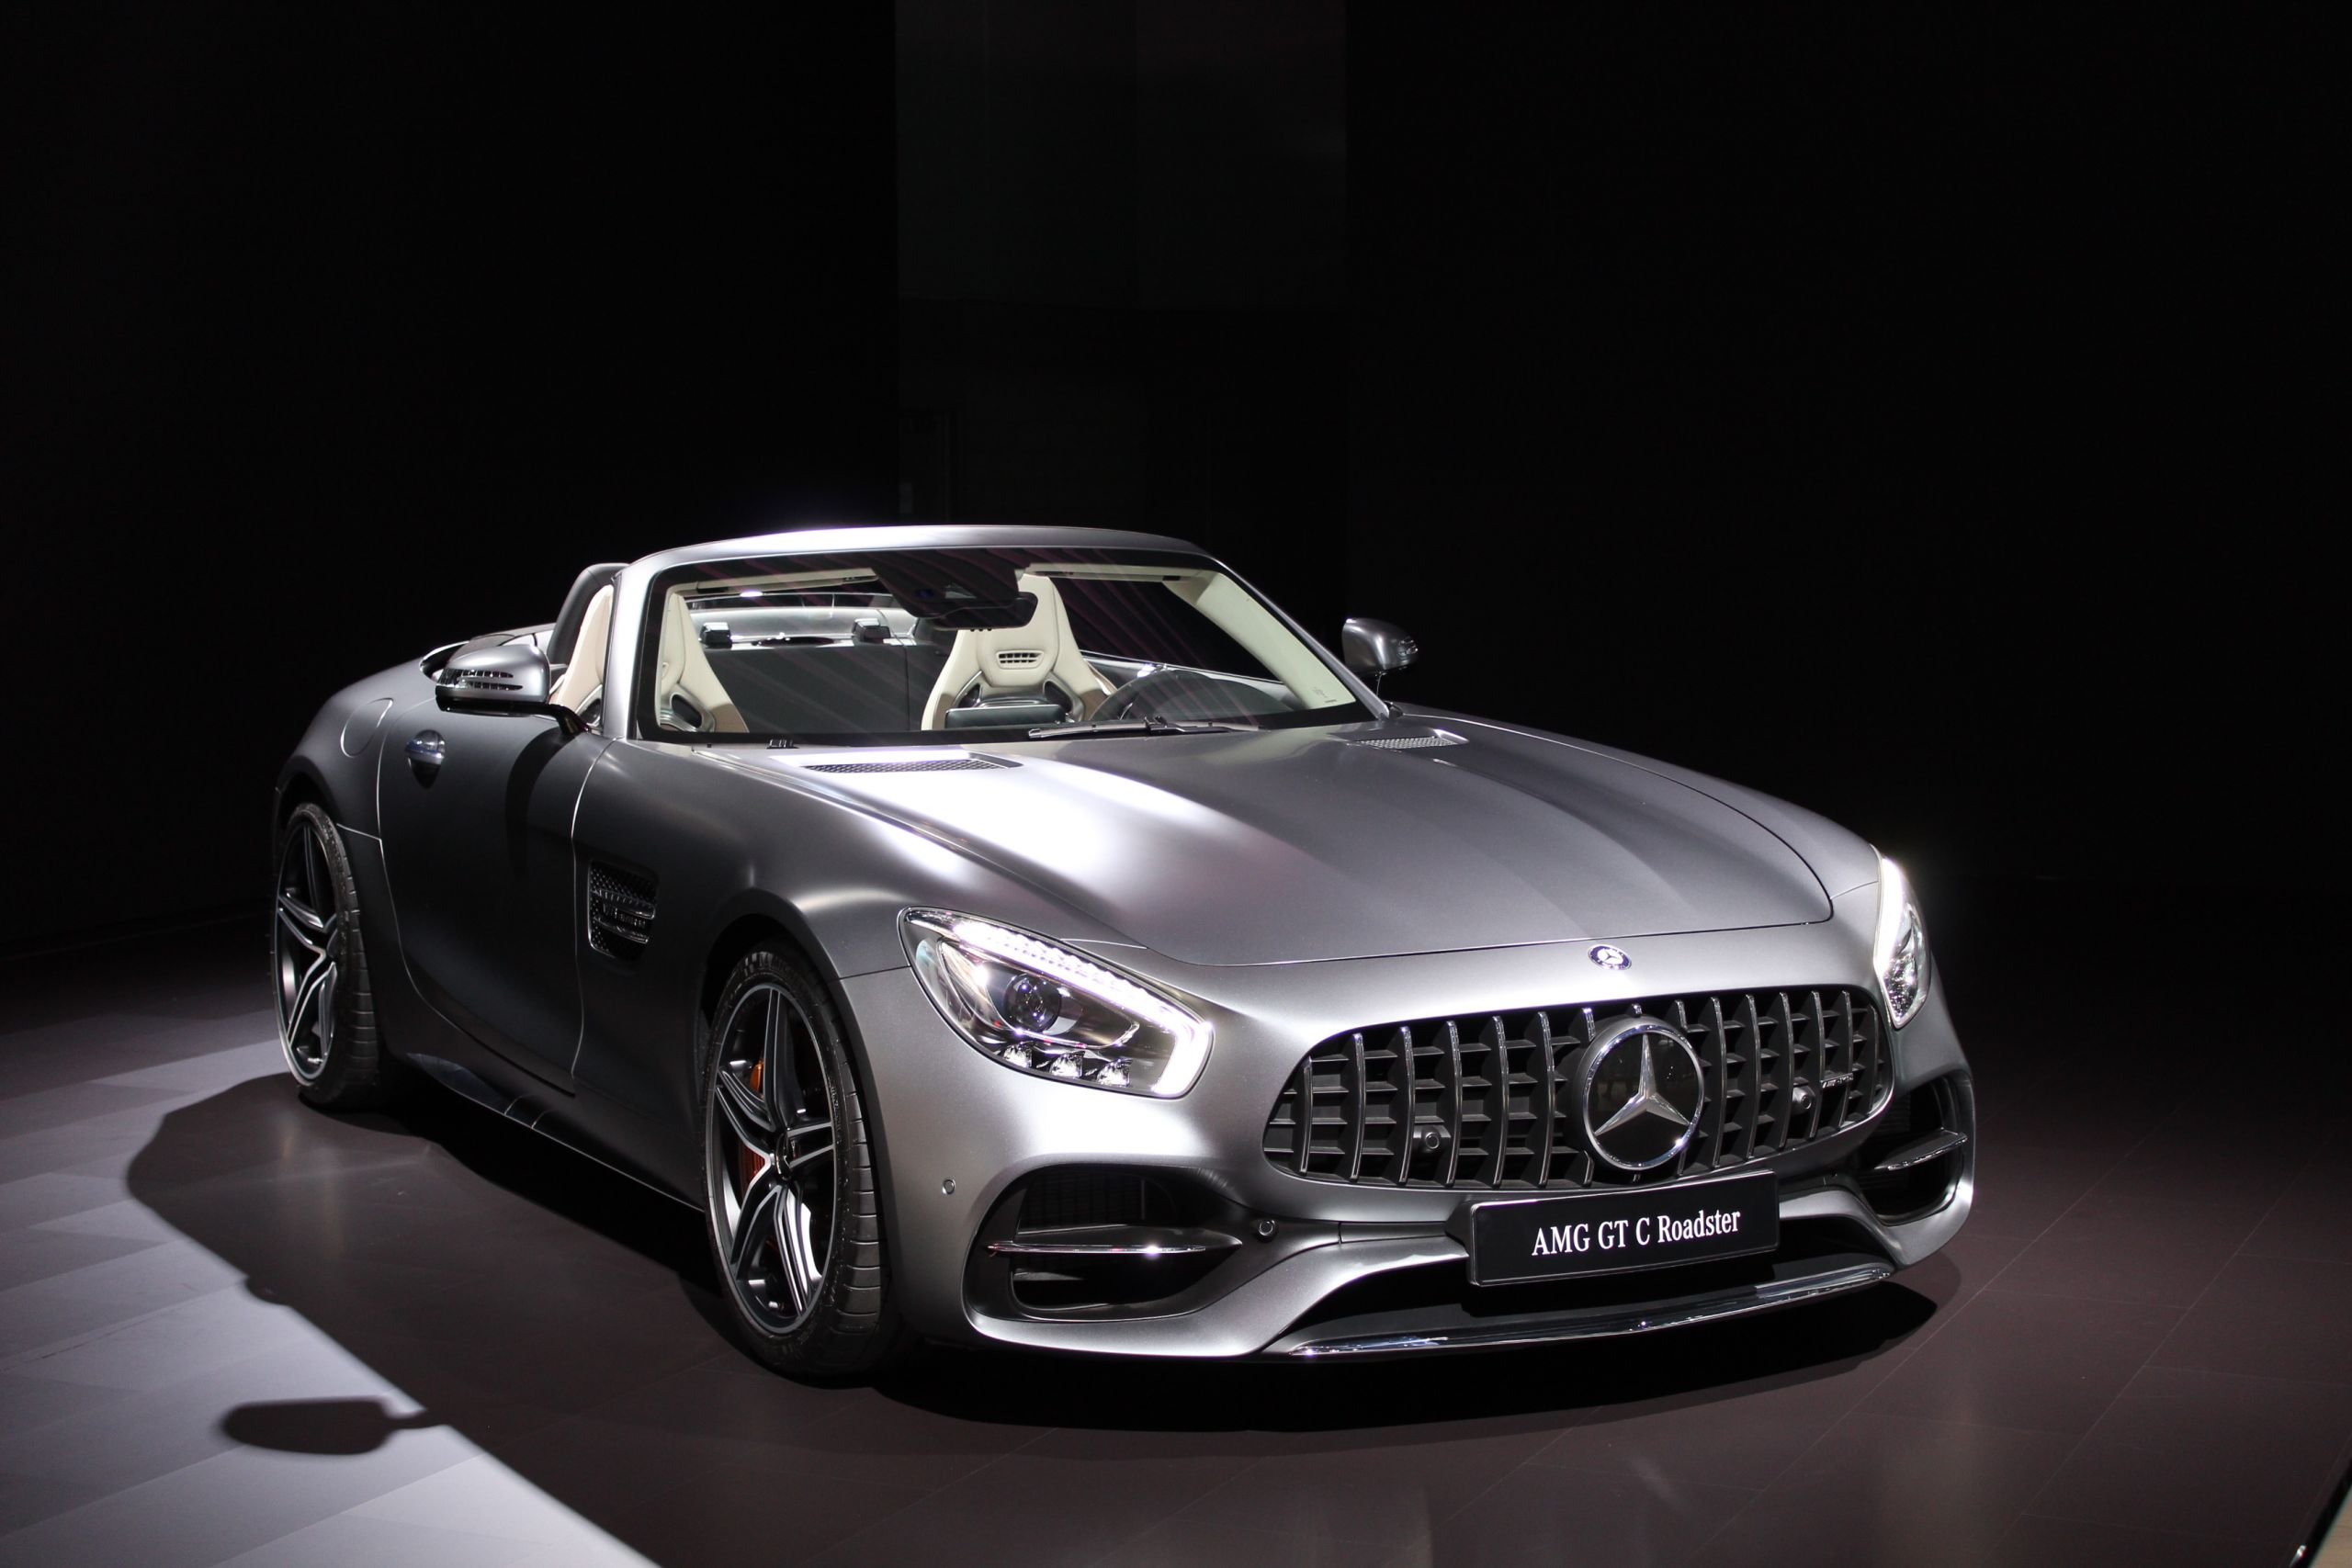 2016 LA Auto Show Mercedes AMG GT C Roadster